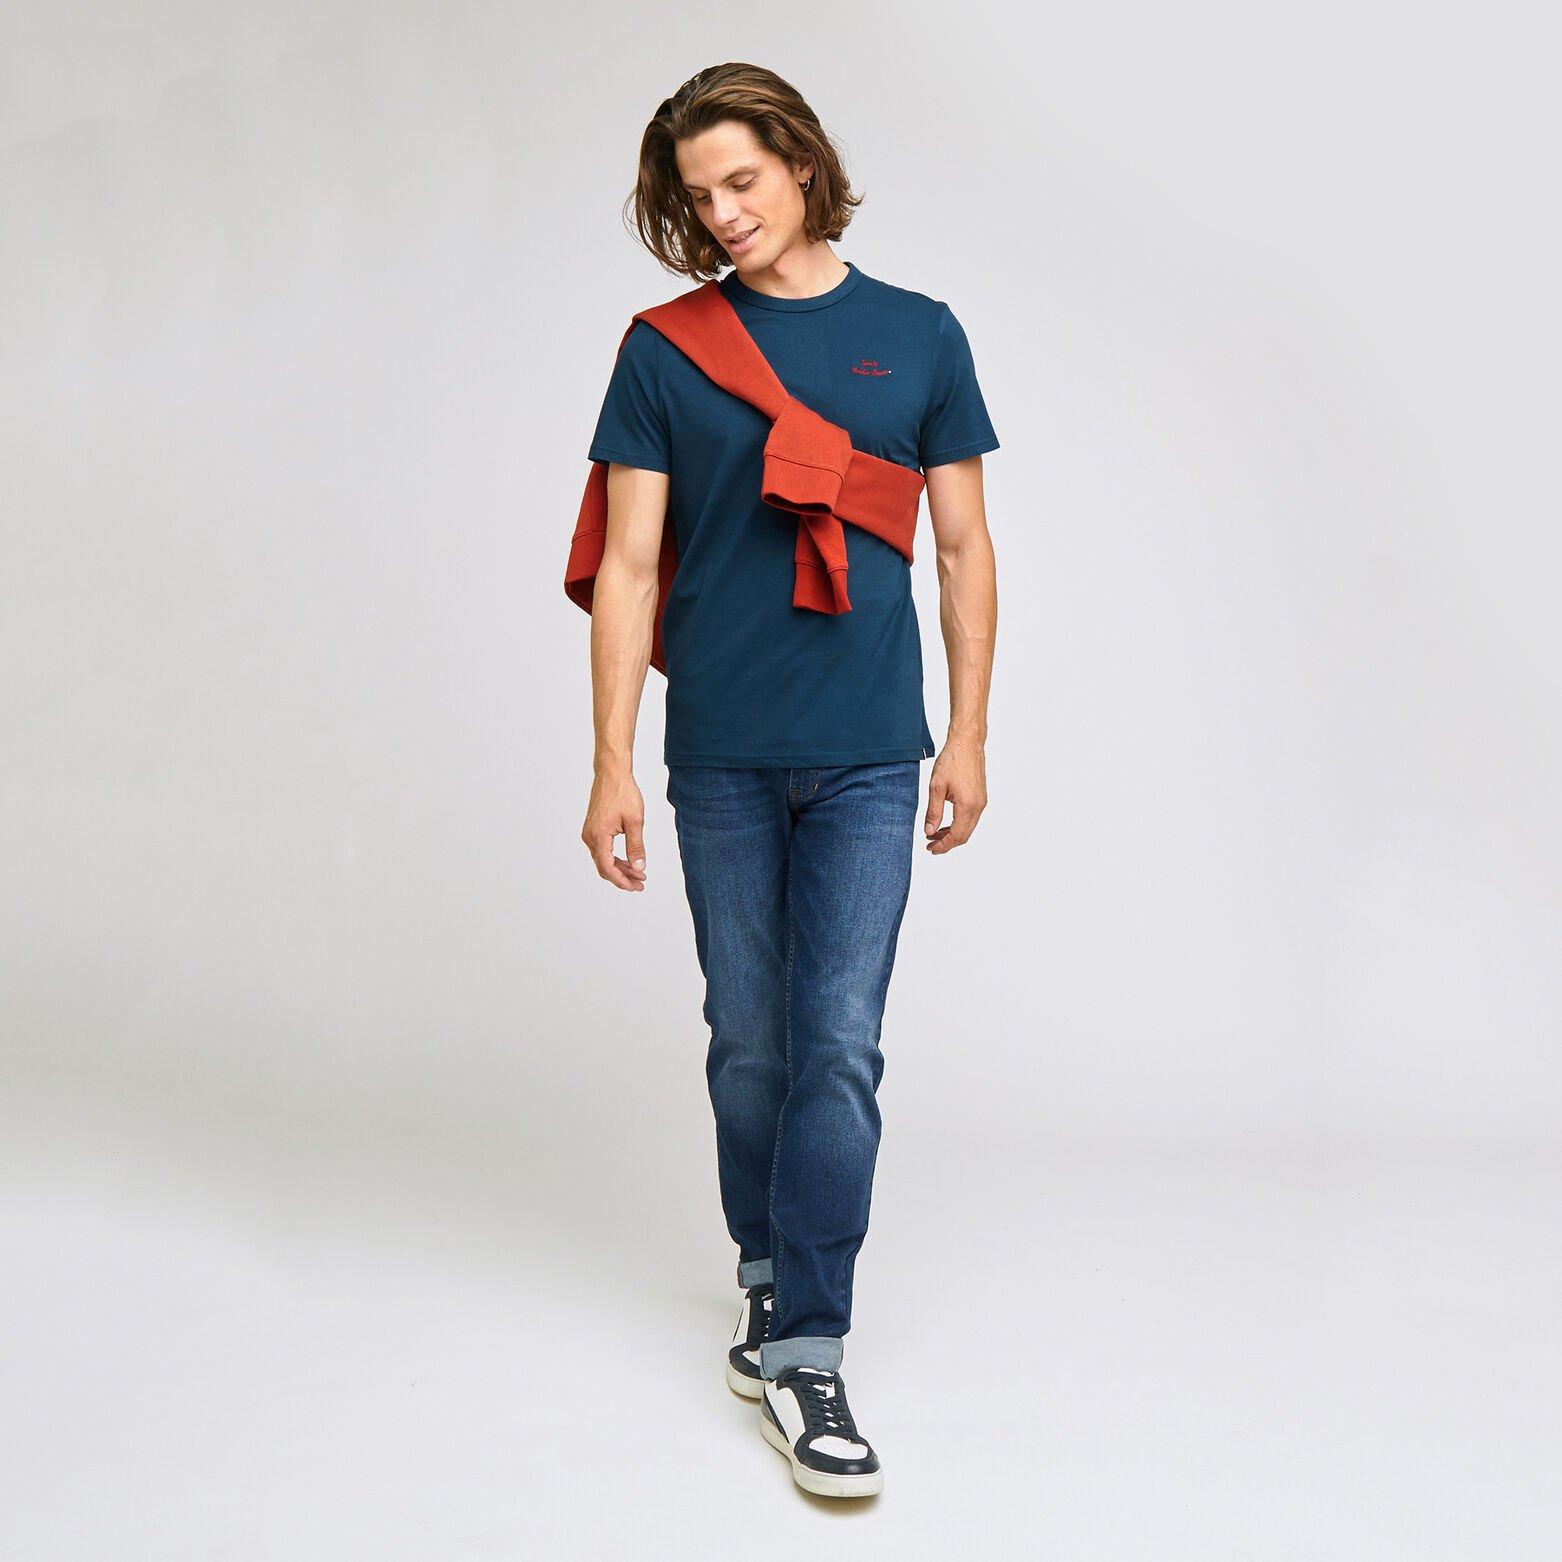 Tee-shirt broderie poitrine